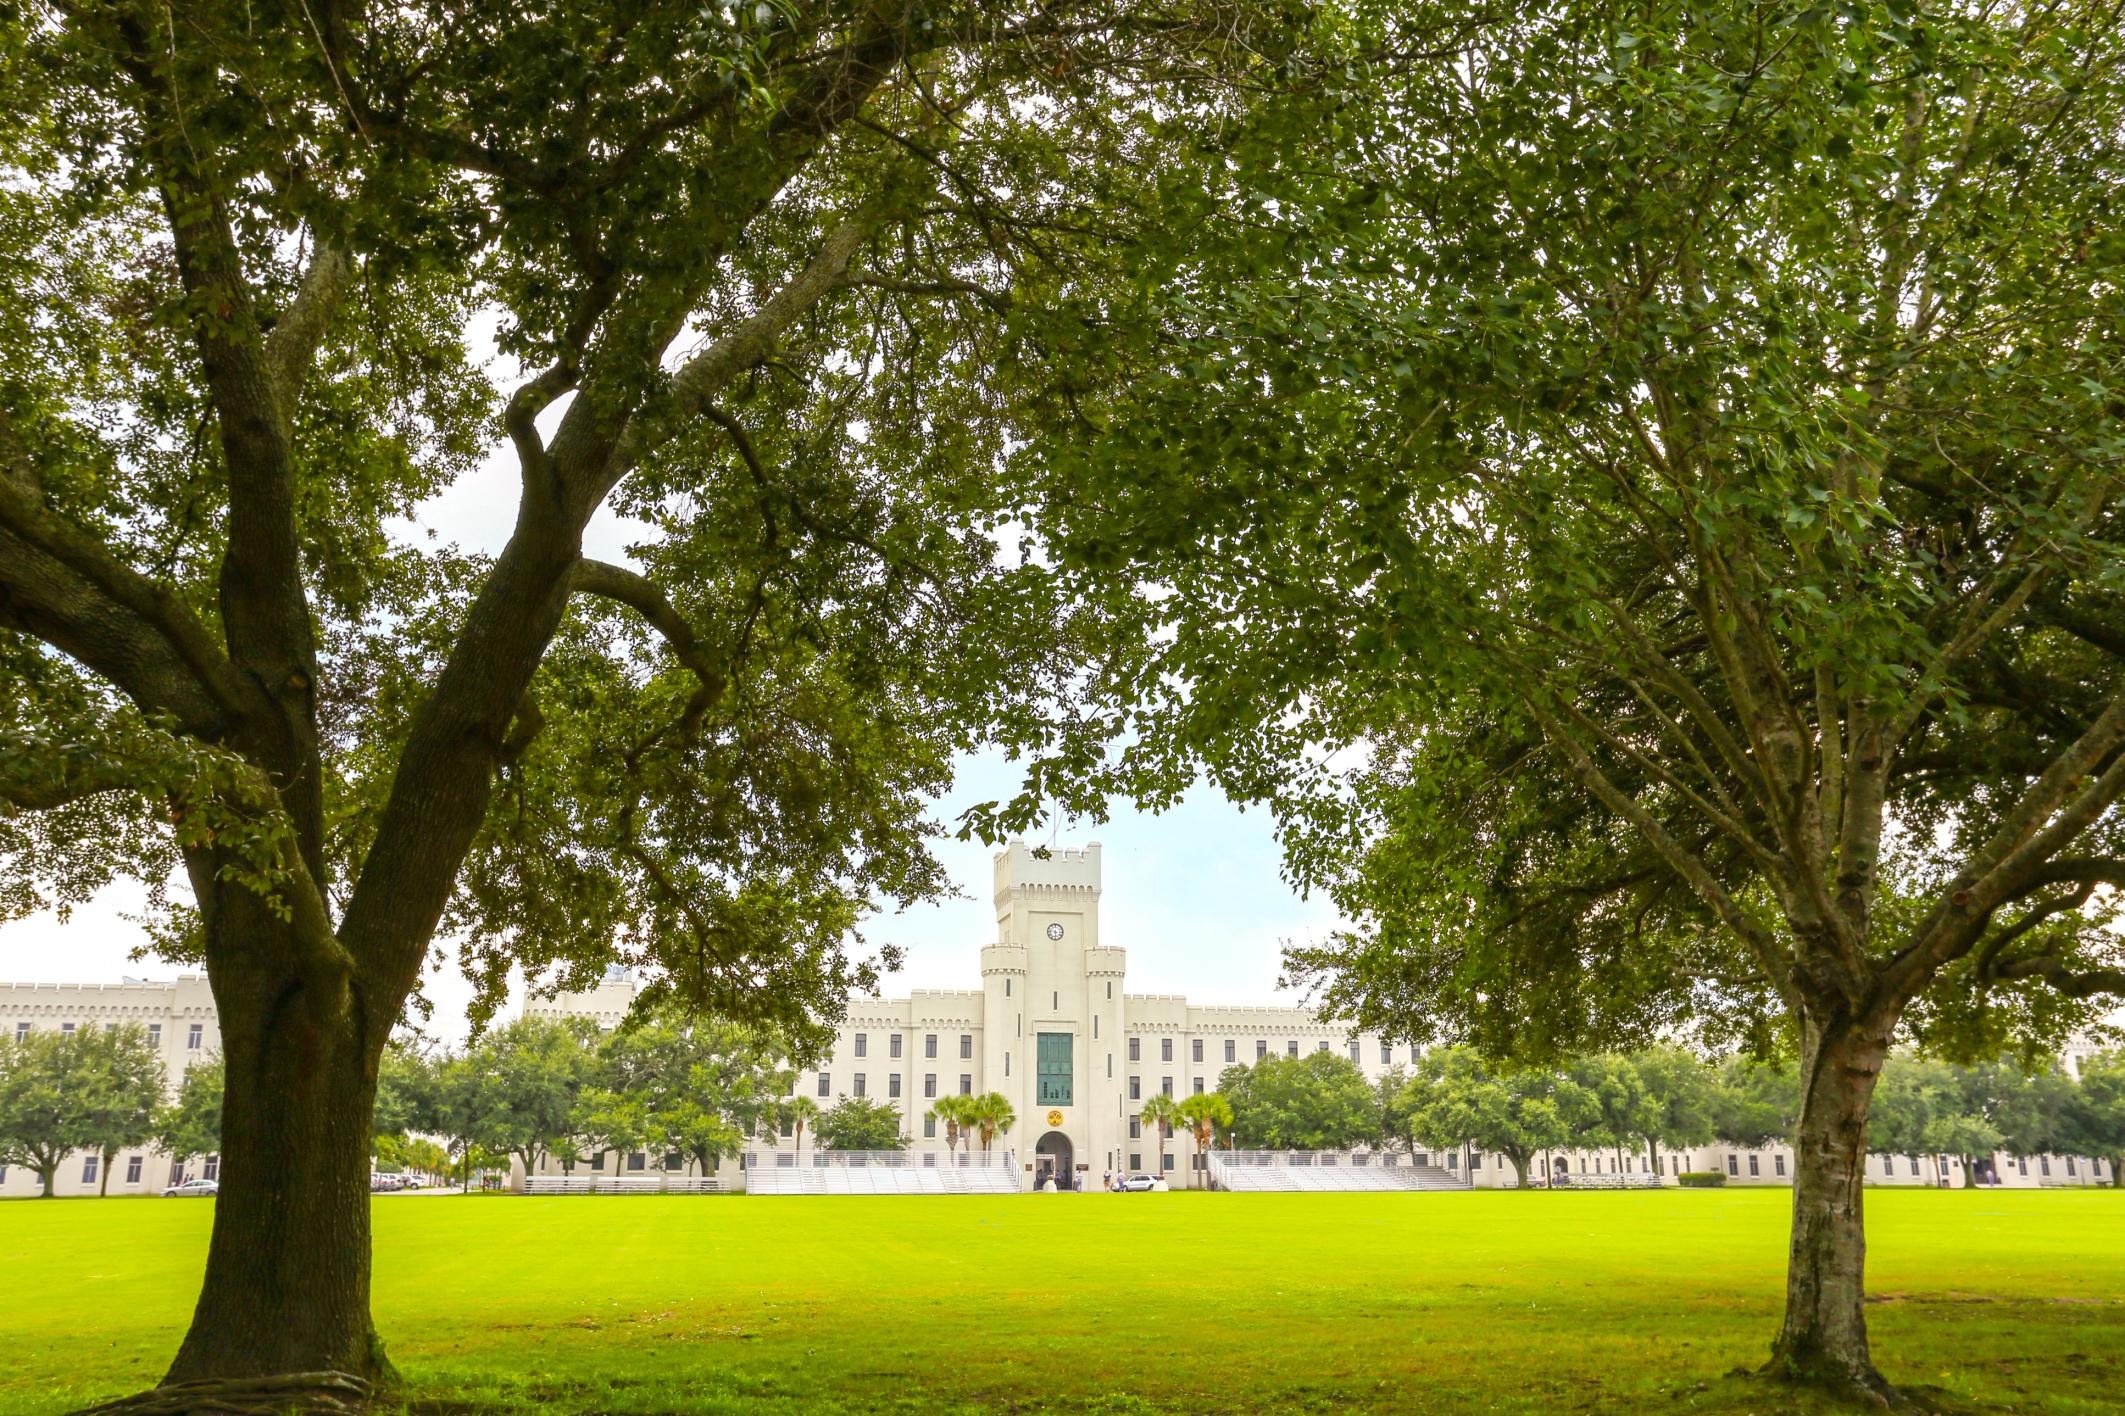 The Citadel in Charleston